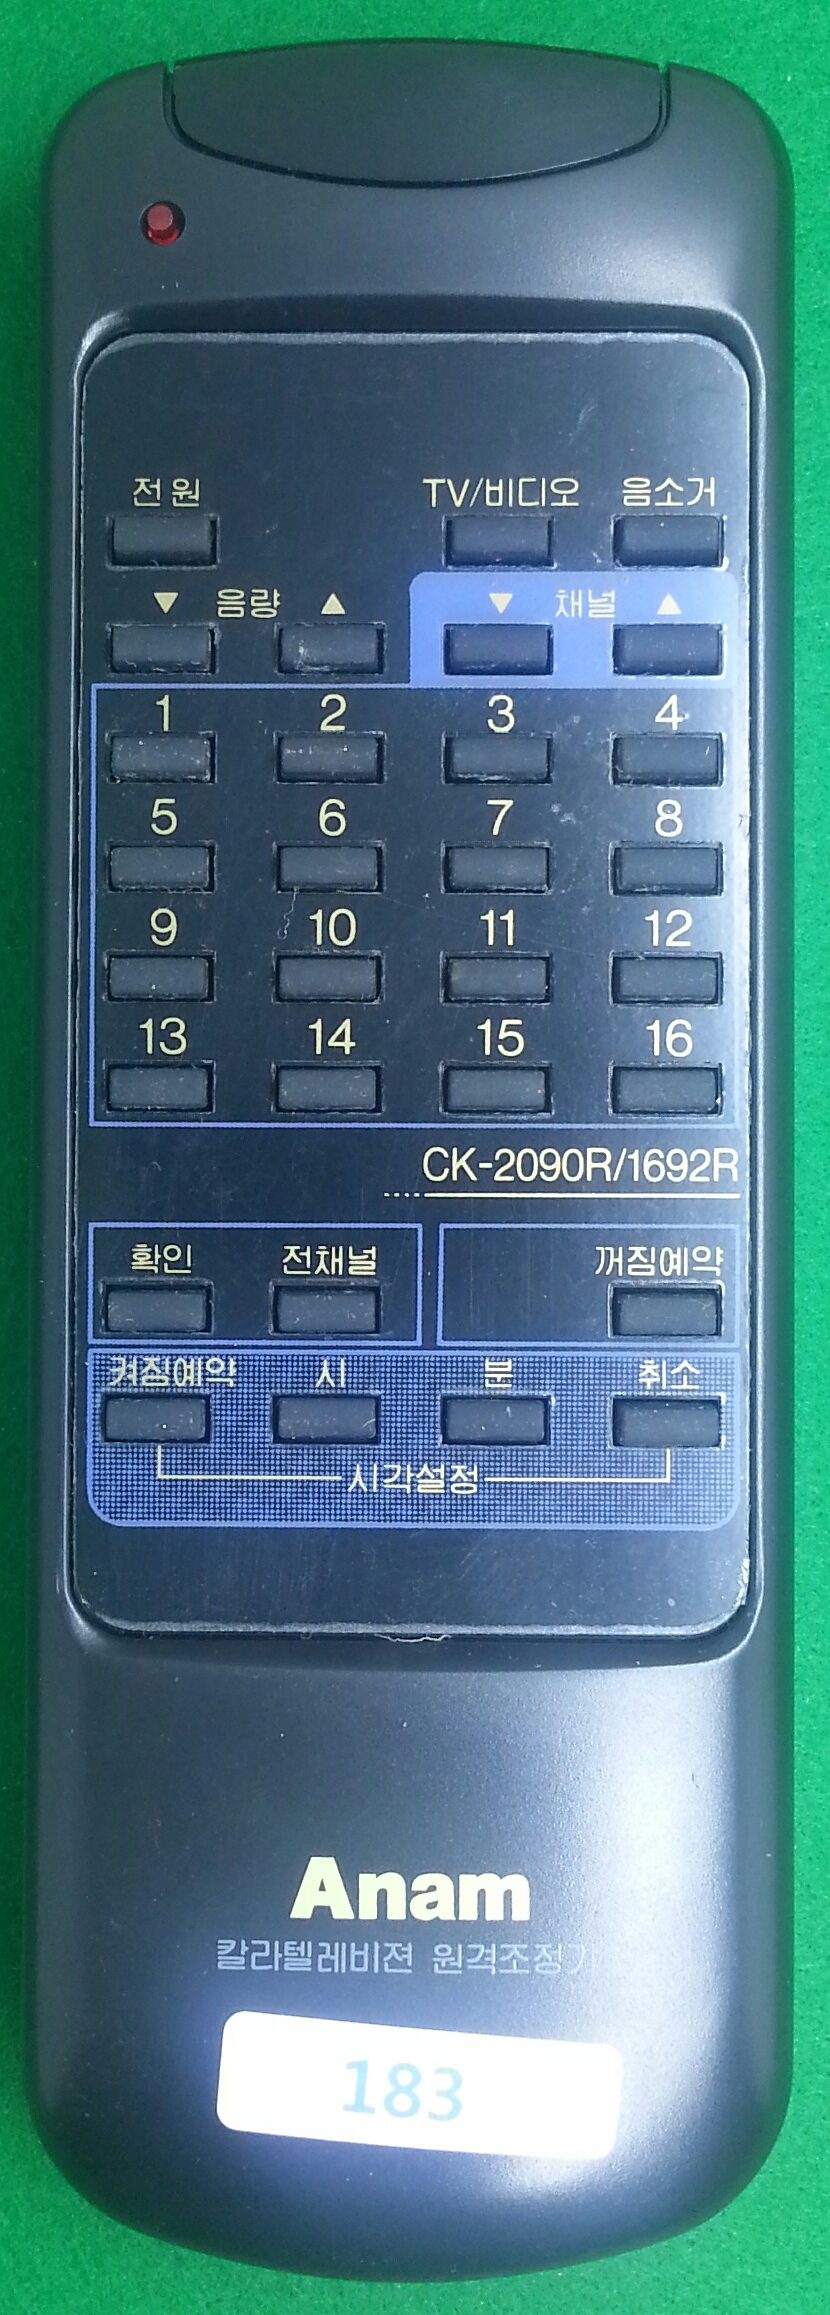 183_ANAM_CK-2090R_cover-0.jpg